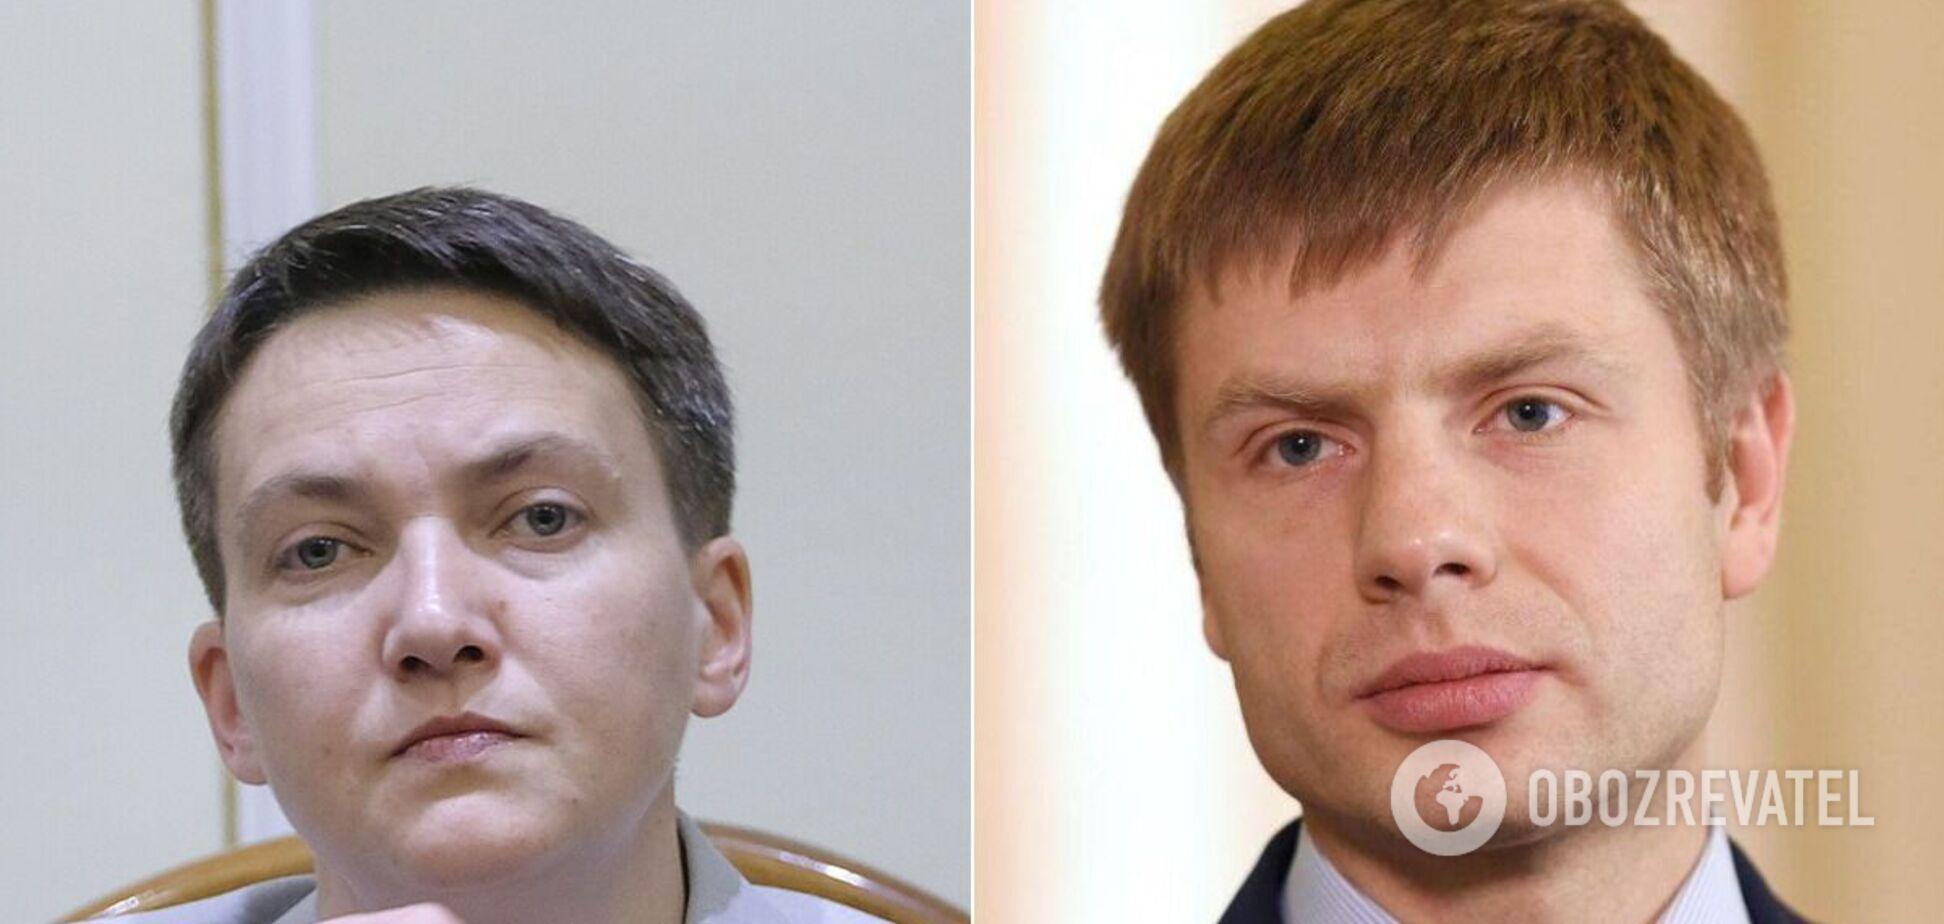 Гончаренко назвав Савченко брехухою